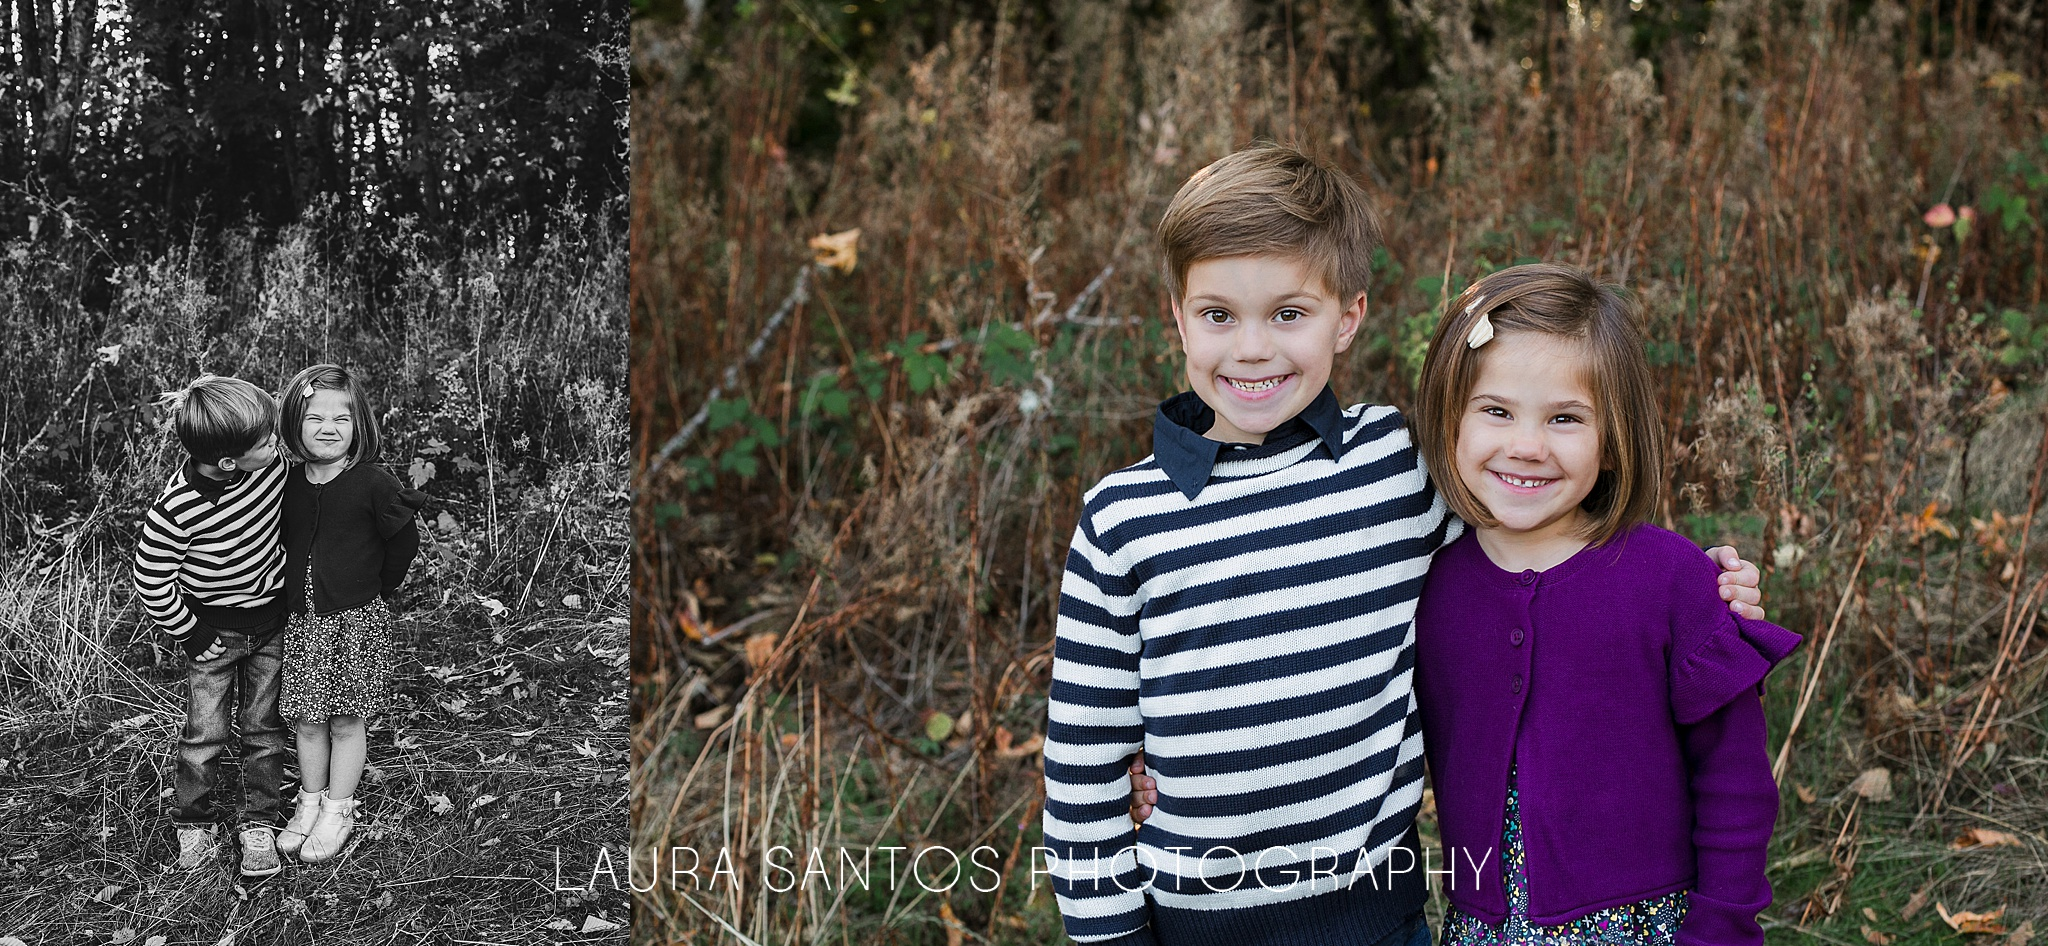 Laura Santos Photography Portland Oregon Family Photographer_0850.jpg